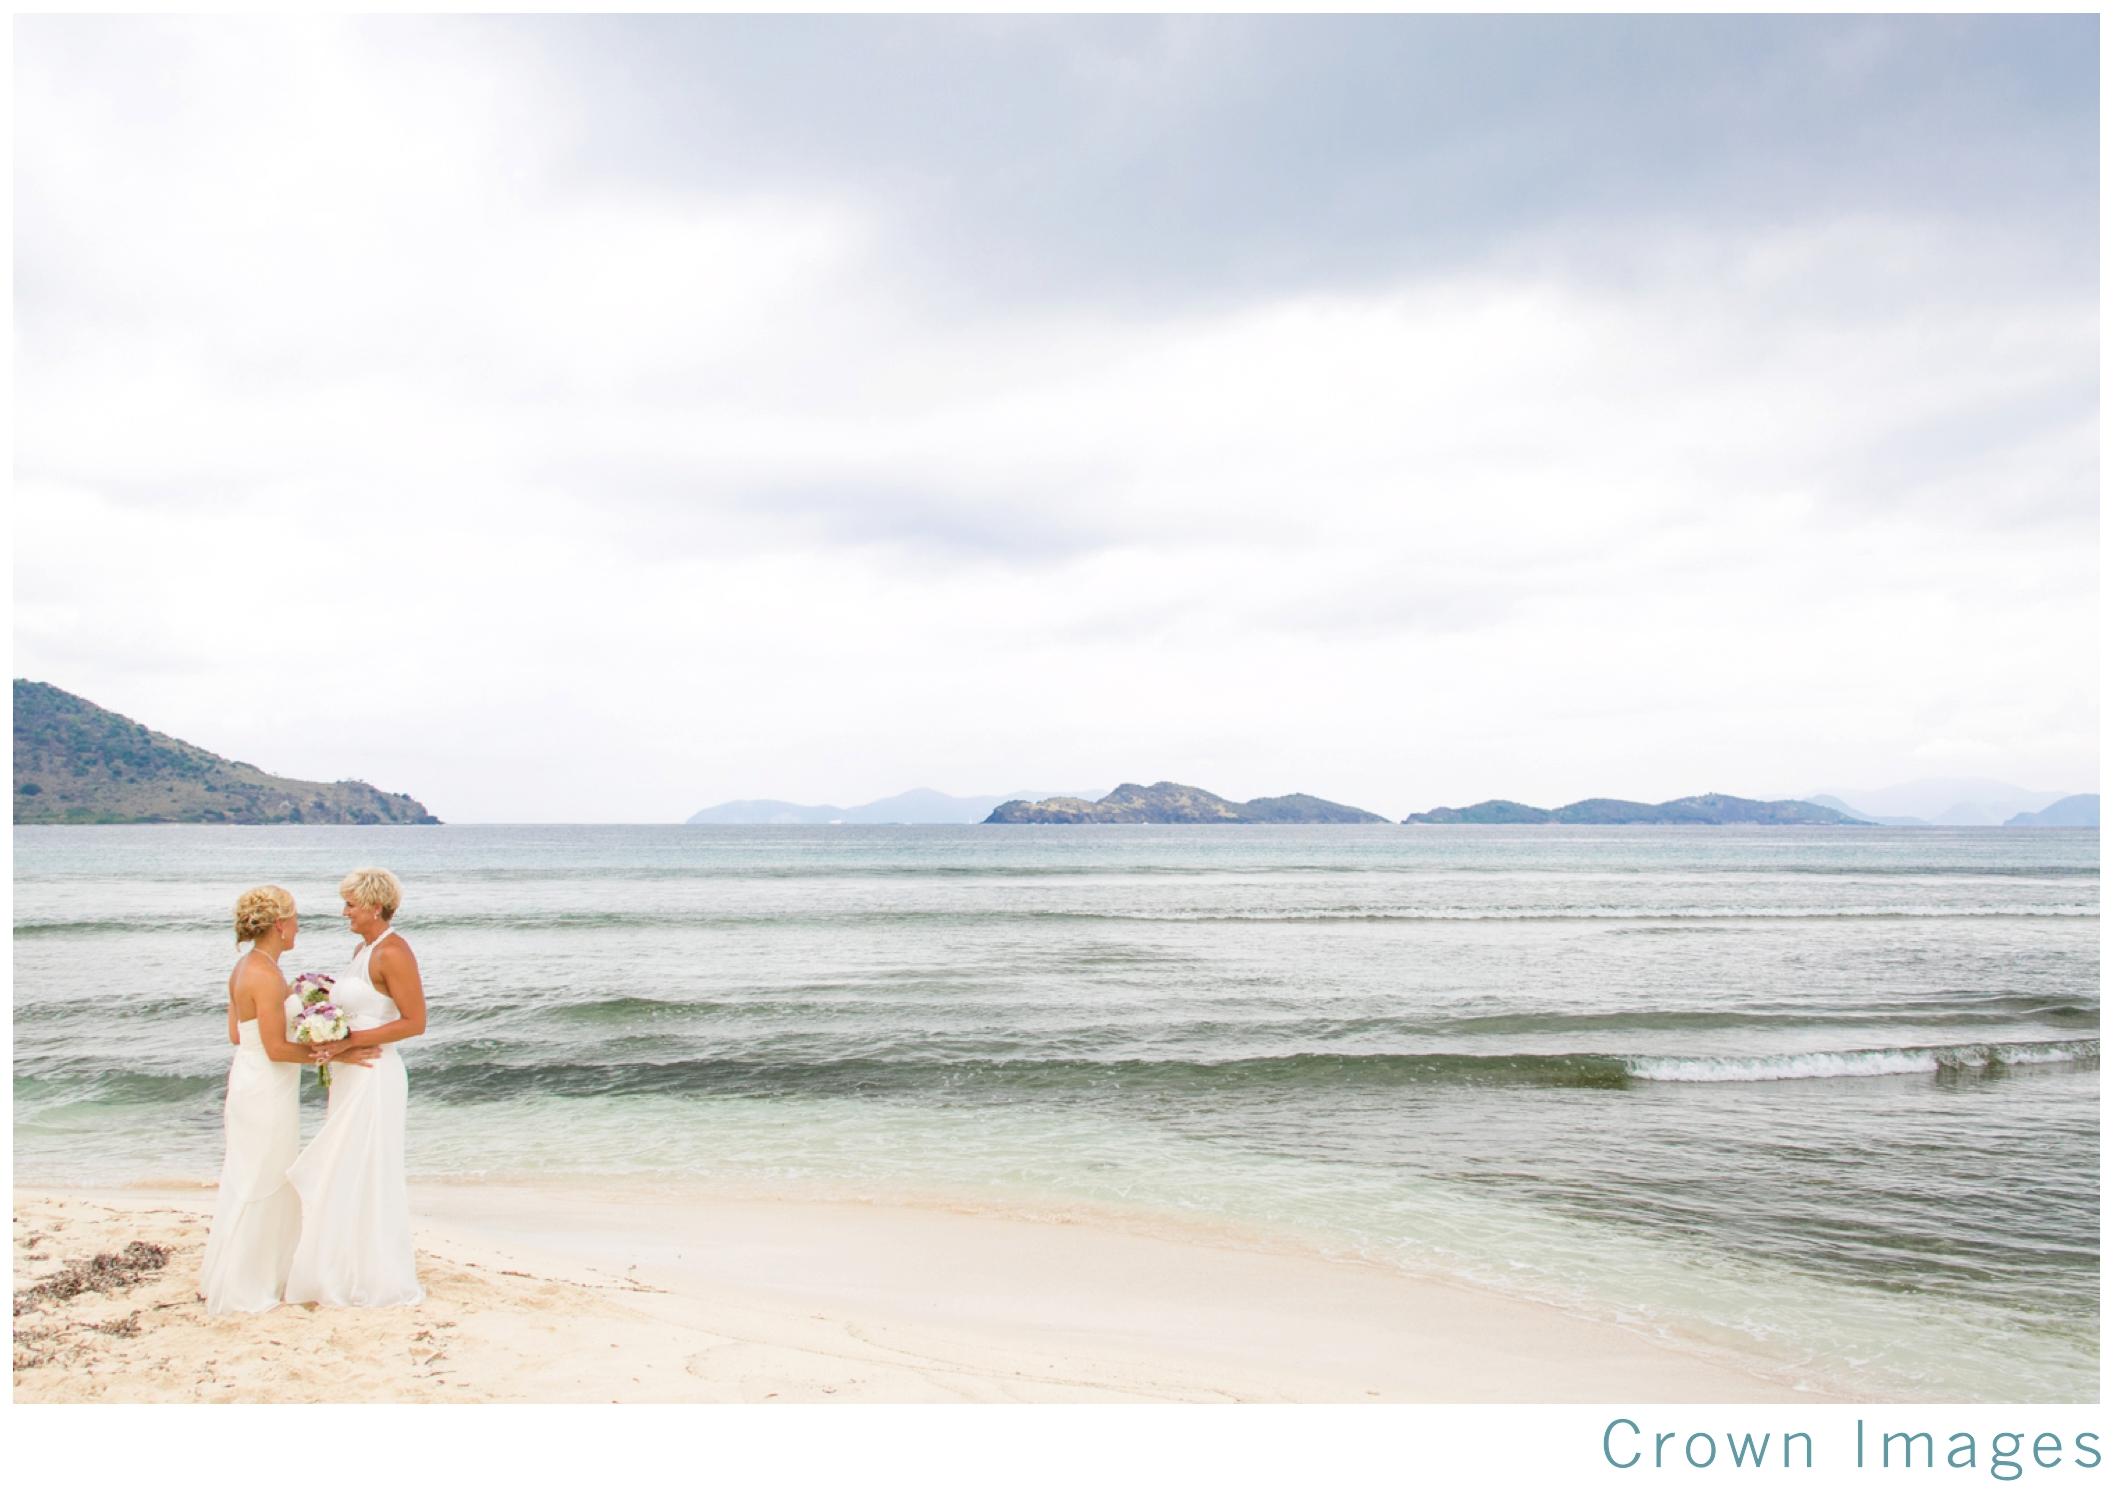 st-thomas-beach-wedding-photos_0918.jpg